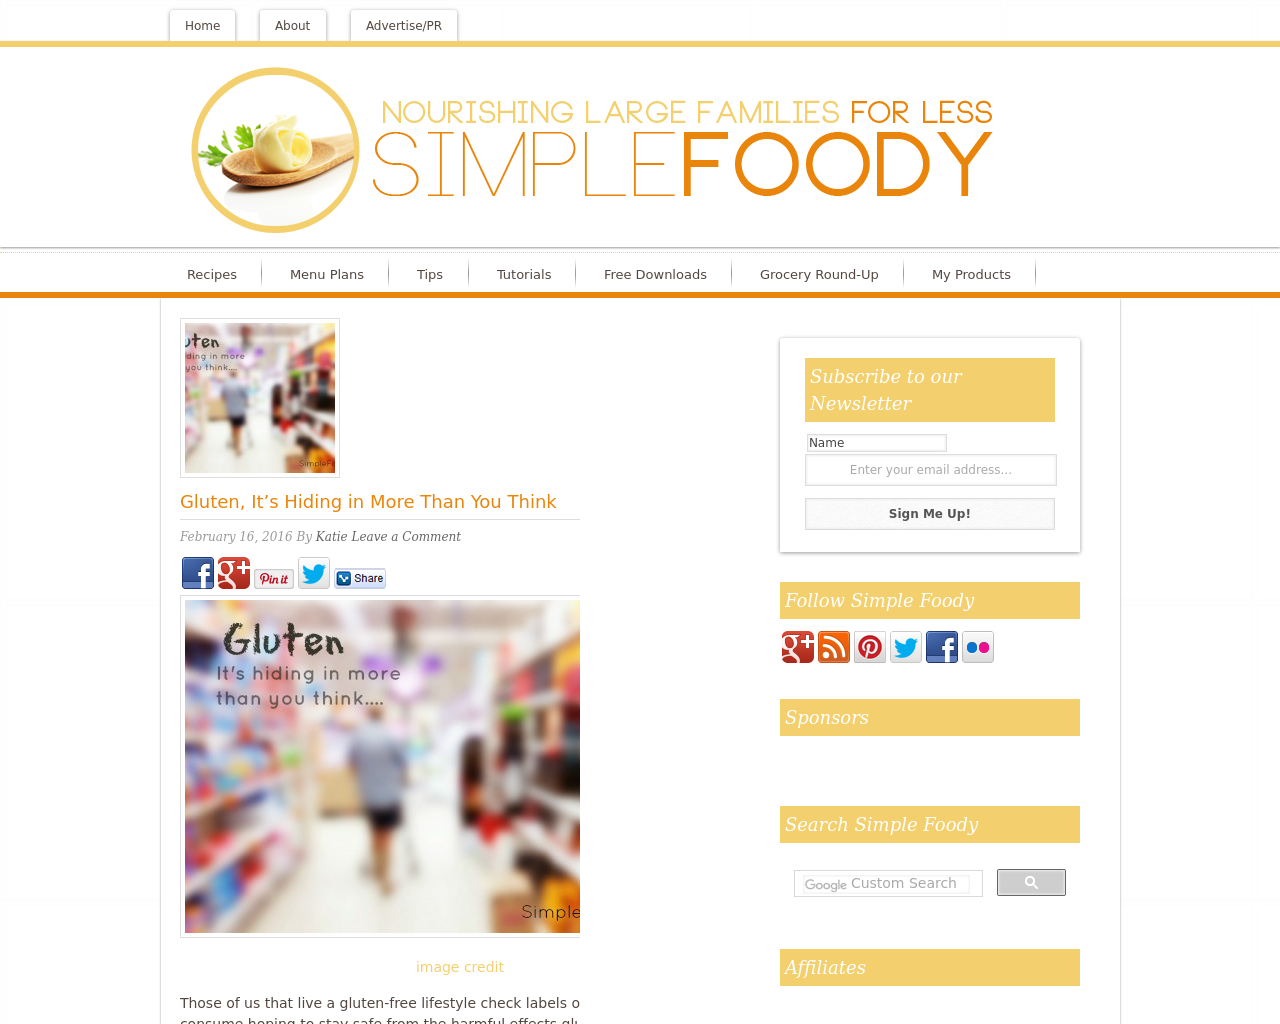 Simple-Foody-Advertising-Reviews-Pricing